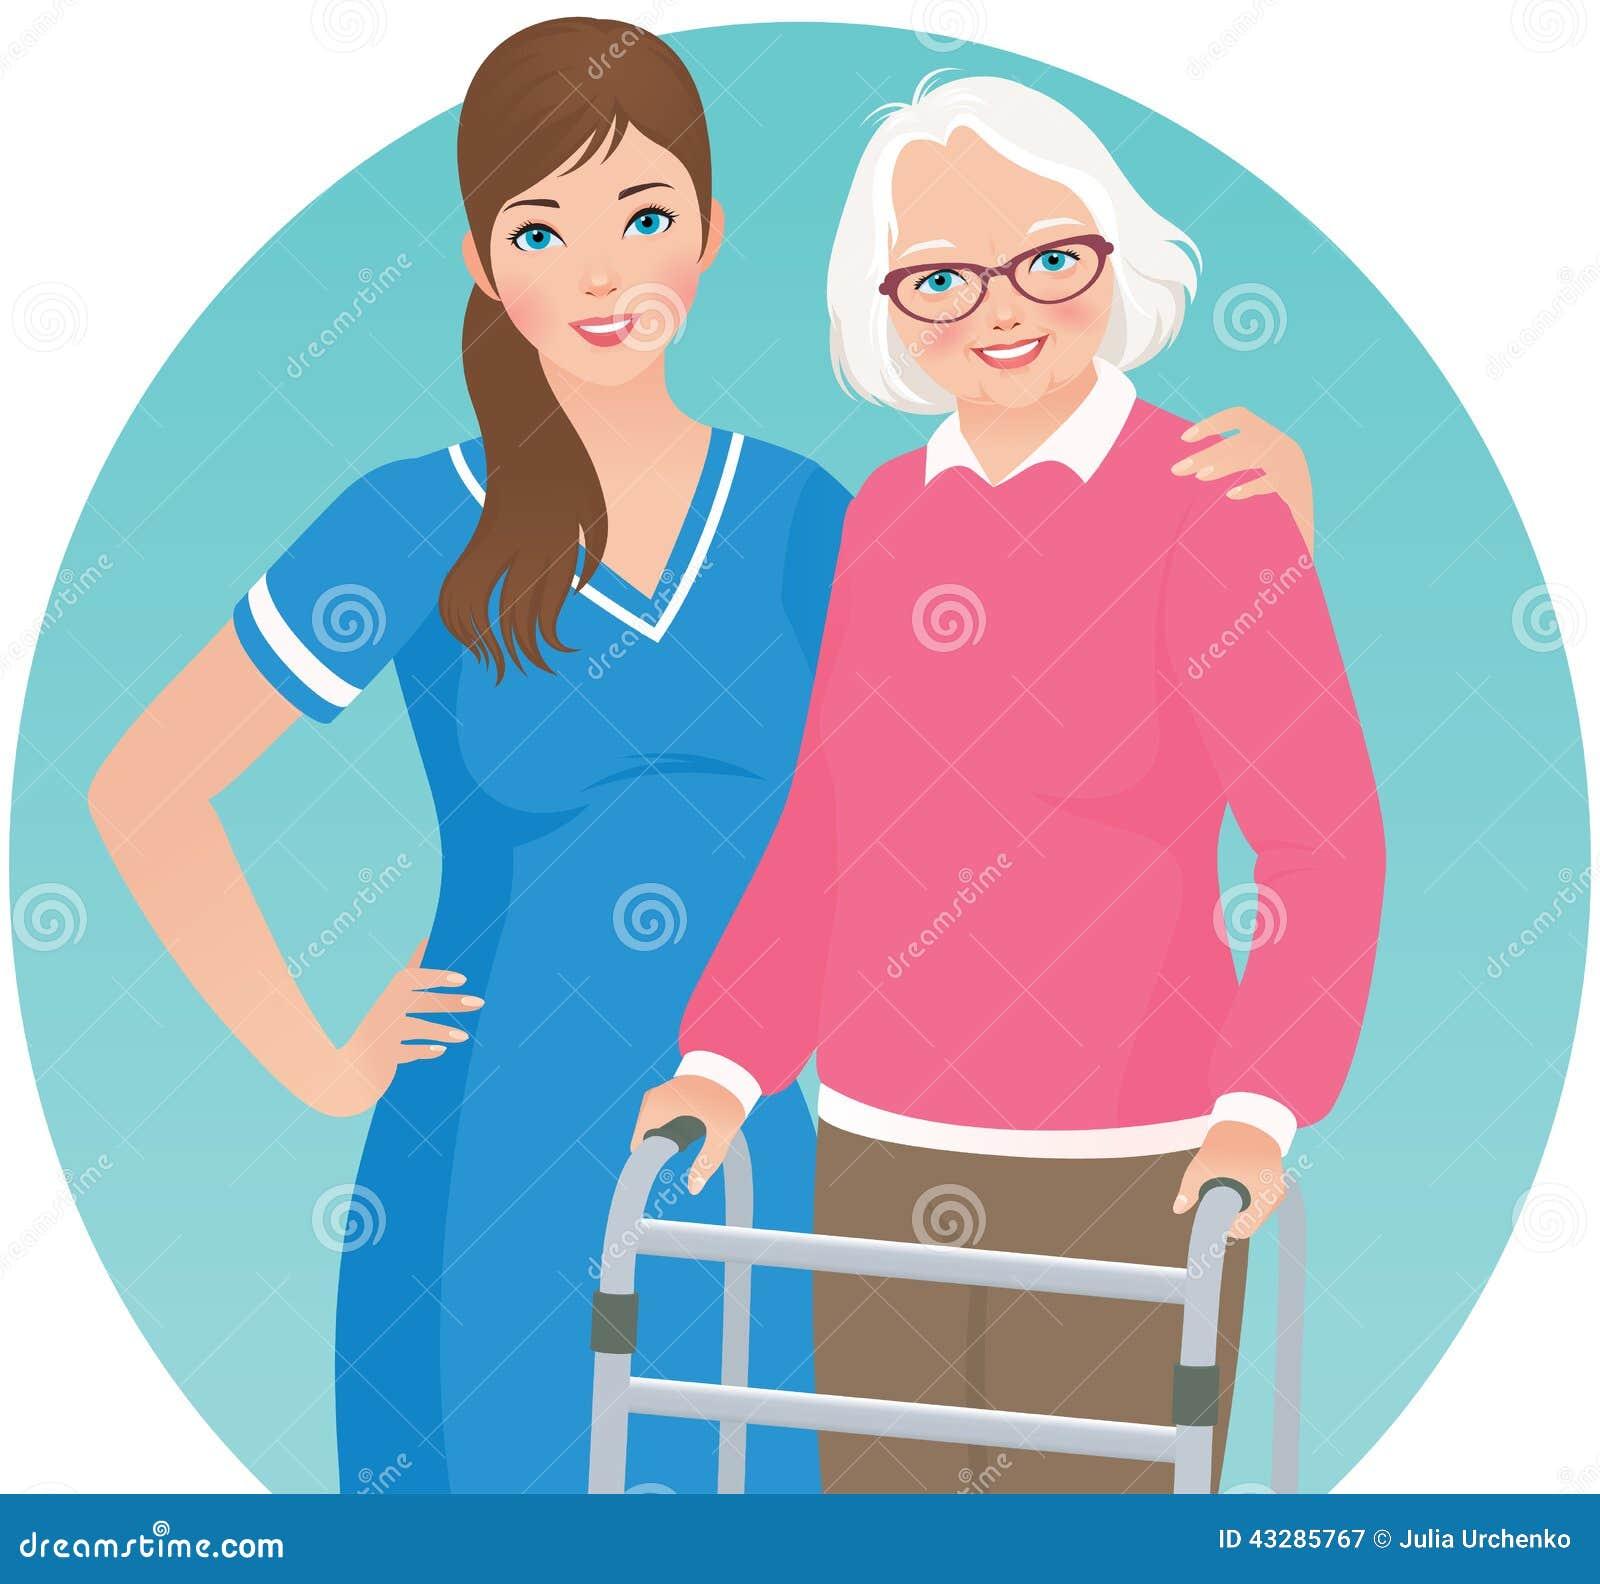 Медсестра и пациент женщина